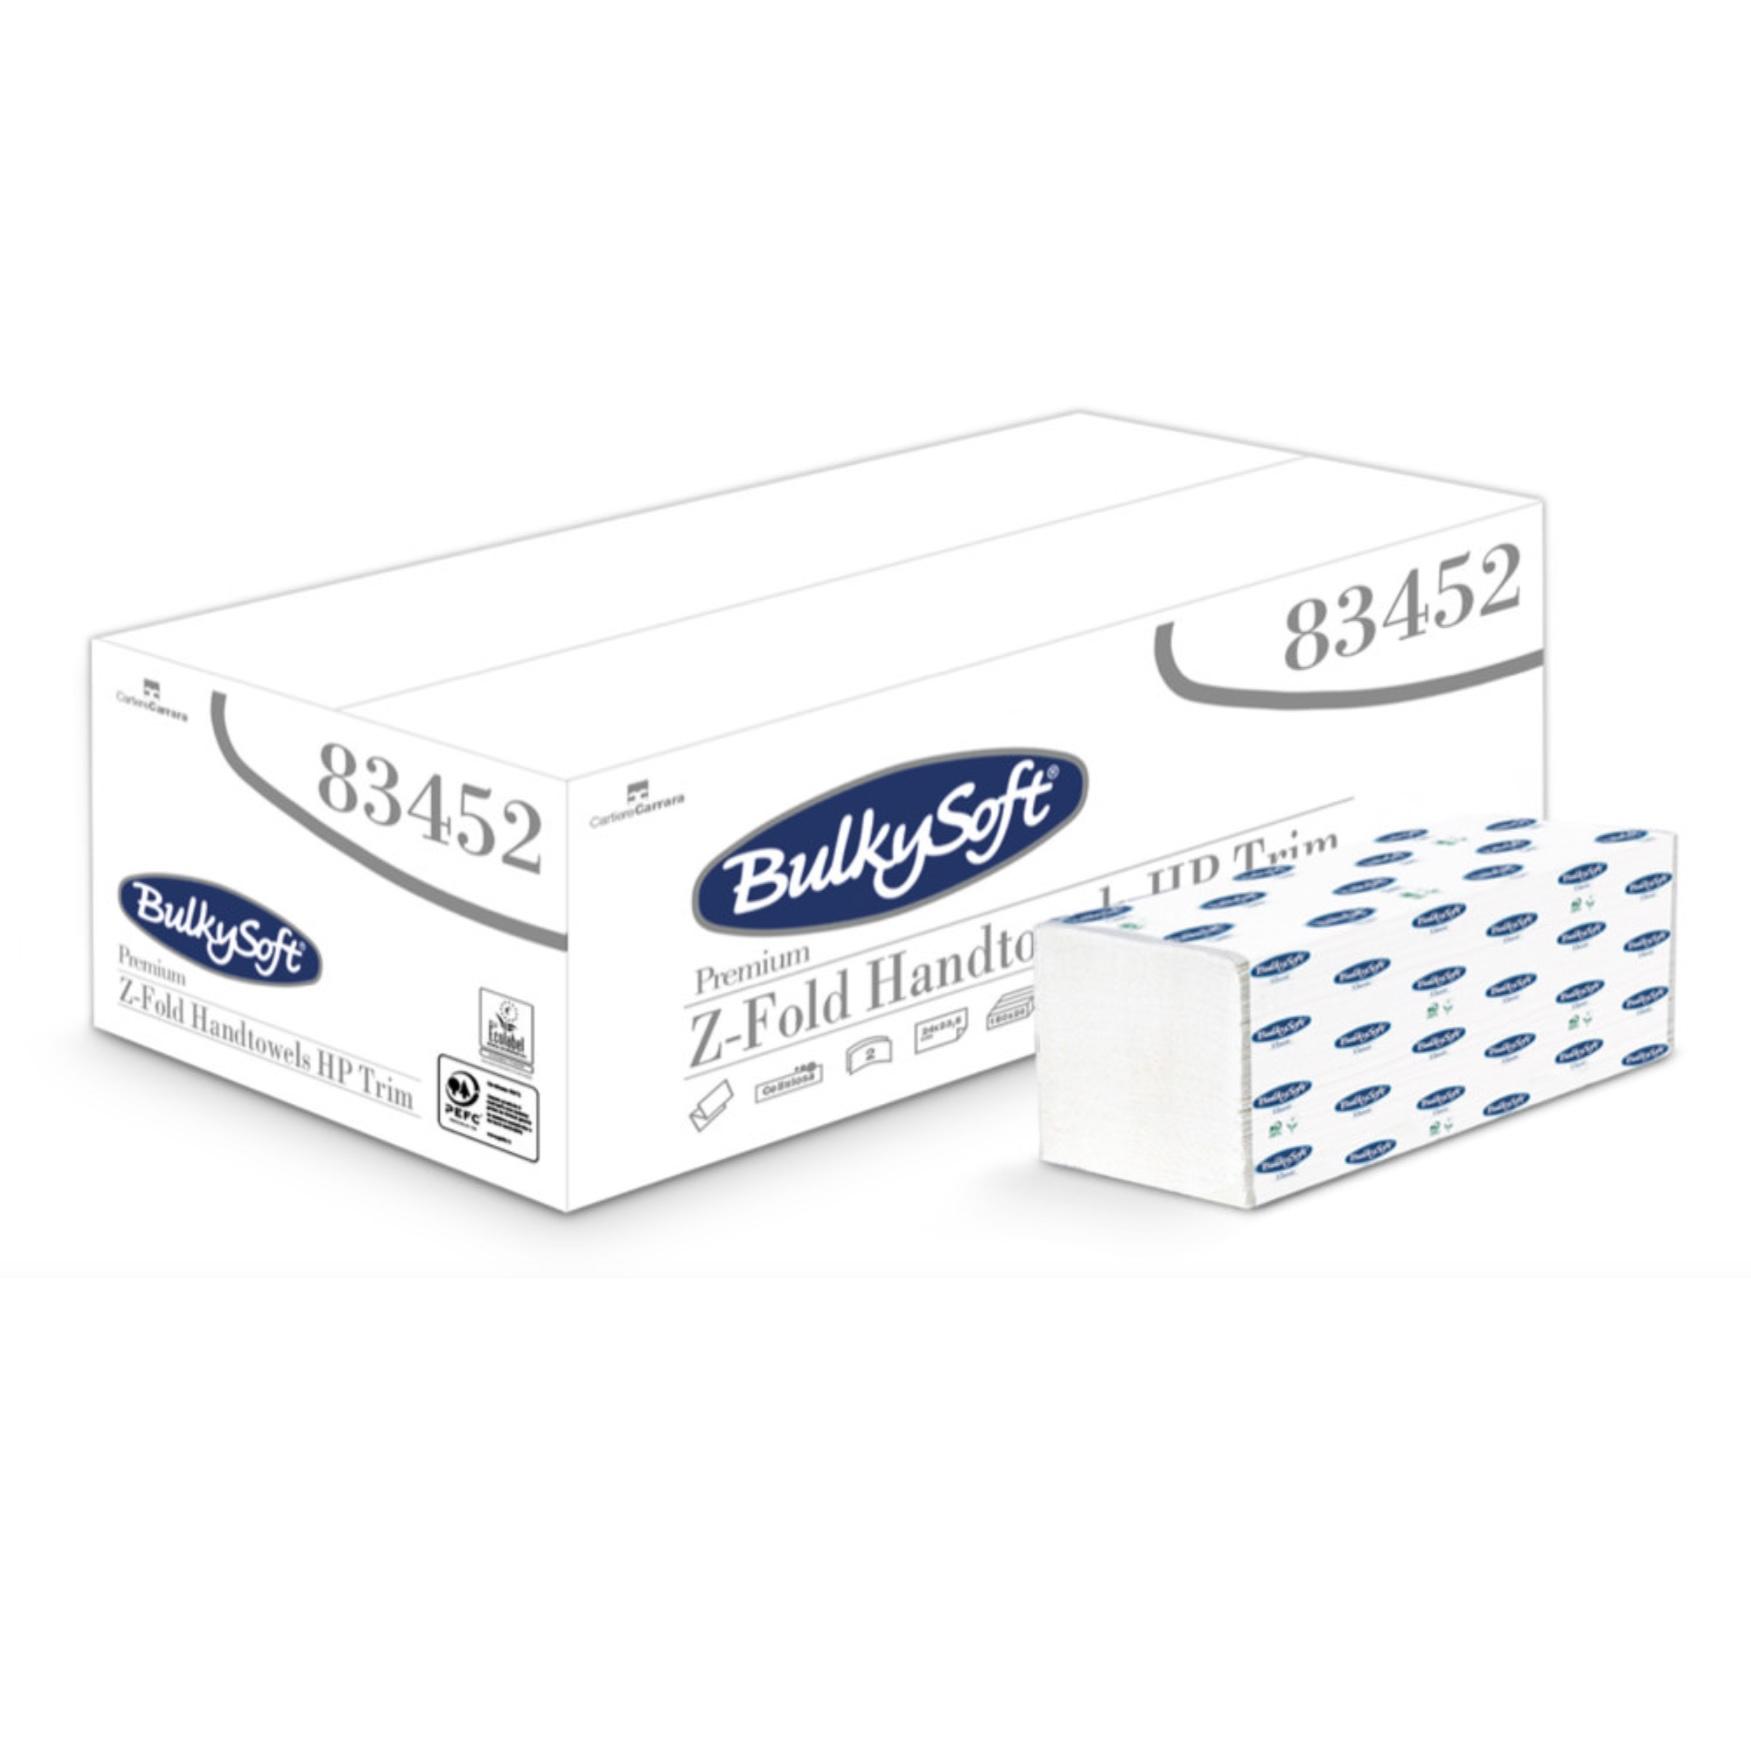 Quattro-QHTZW2-Premium-White-Z-fold-Hand-Towel-2ply---20x150--3000---was-T250W3000-